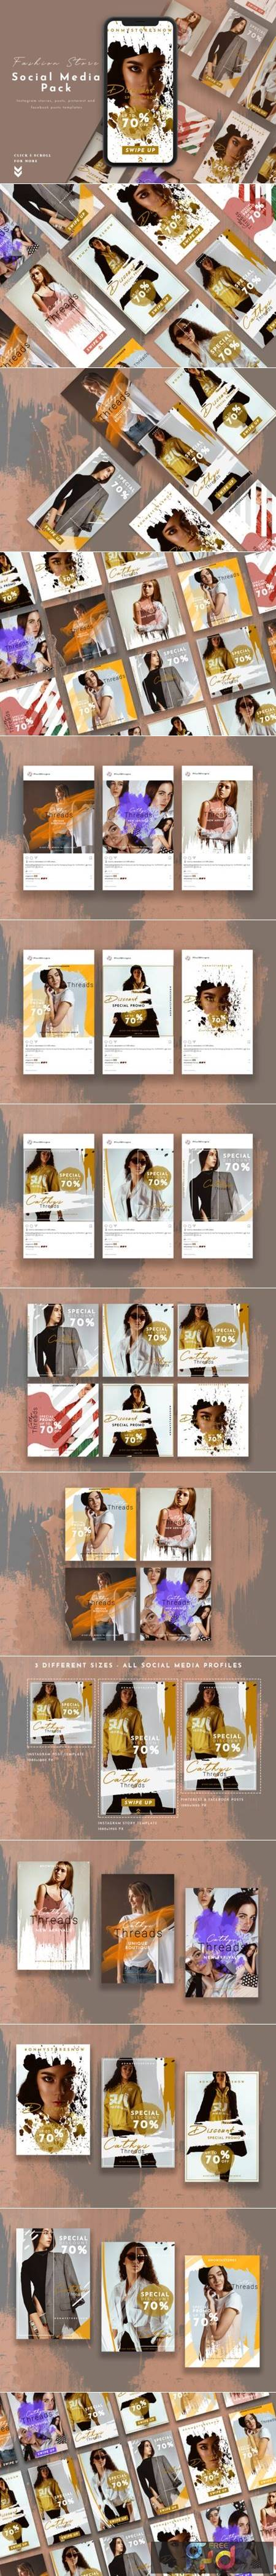 Fashion Store Social Media Pack 3814943 1